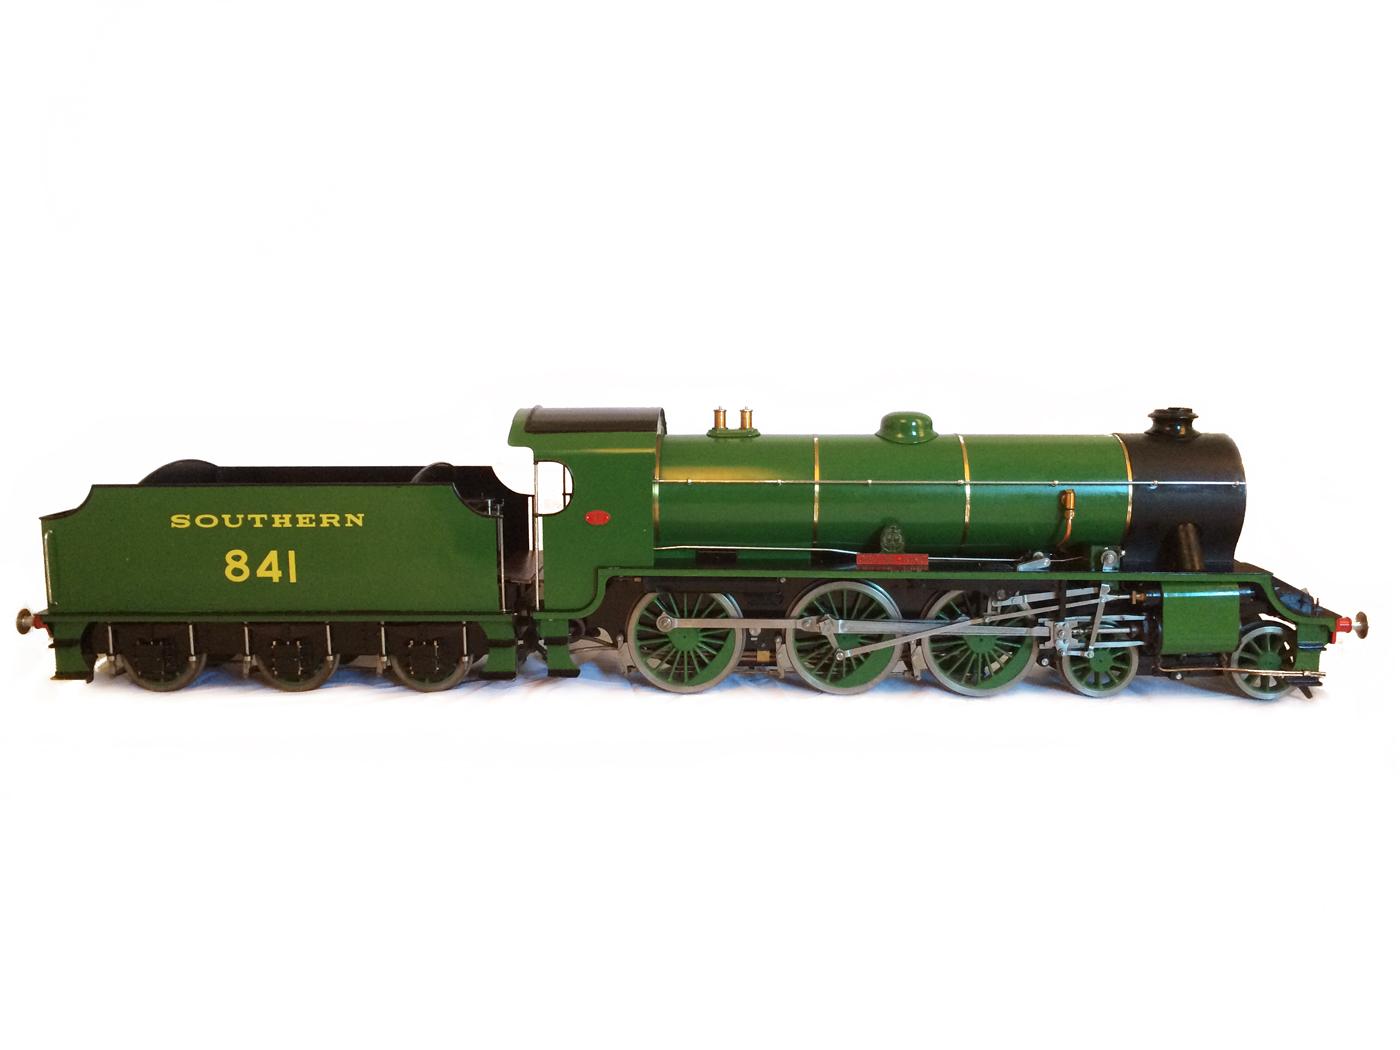 test Southern King Arthur live steam miniature locomotive for sale 17